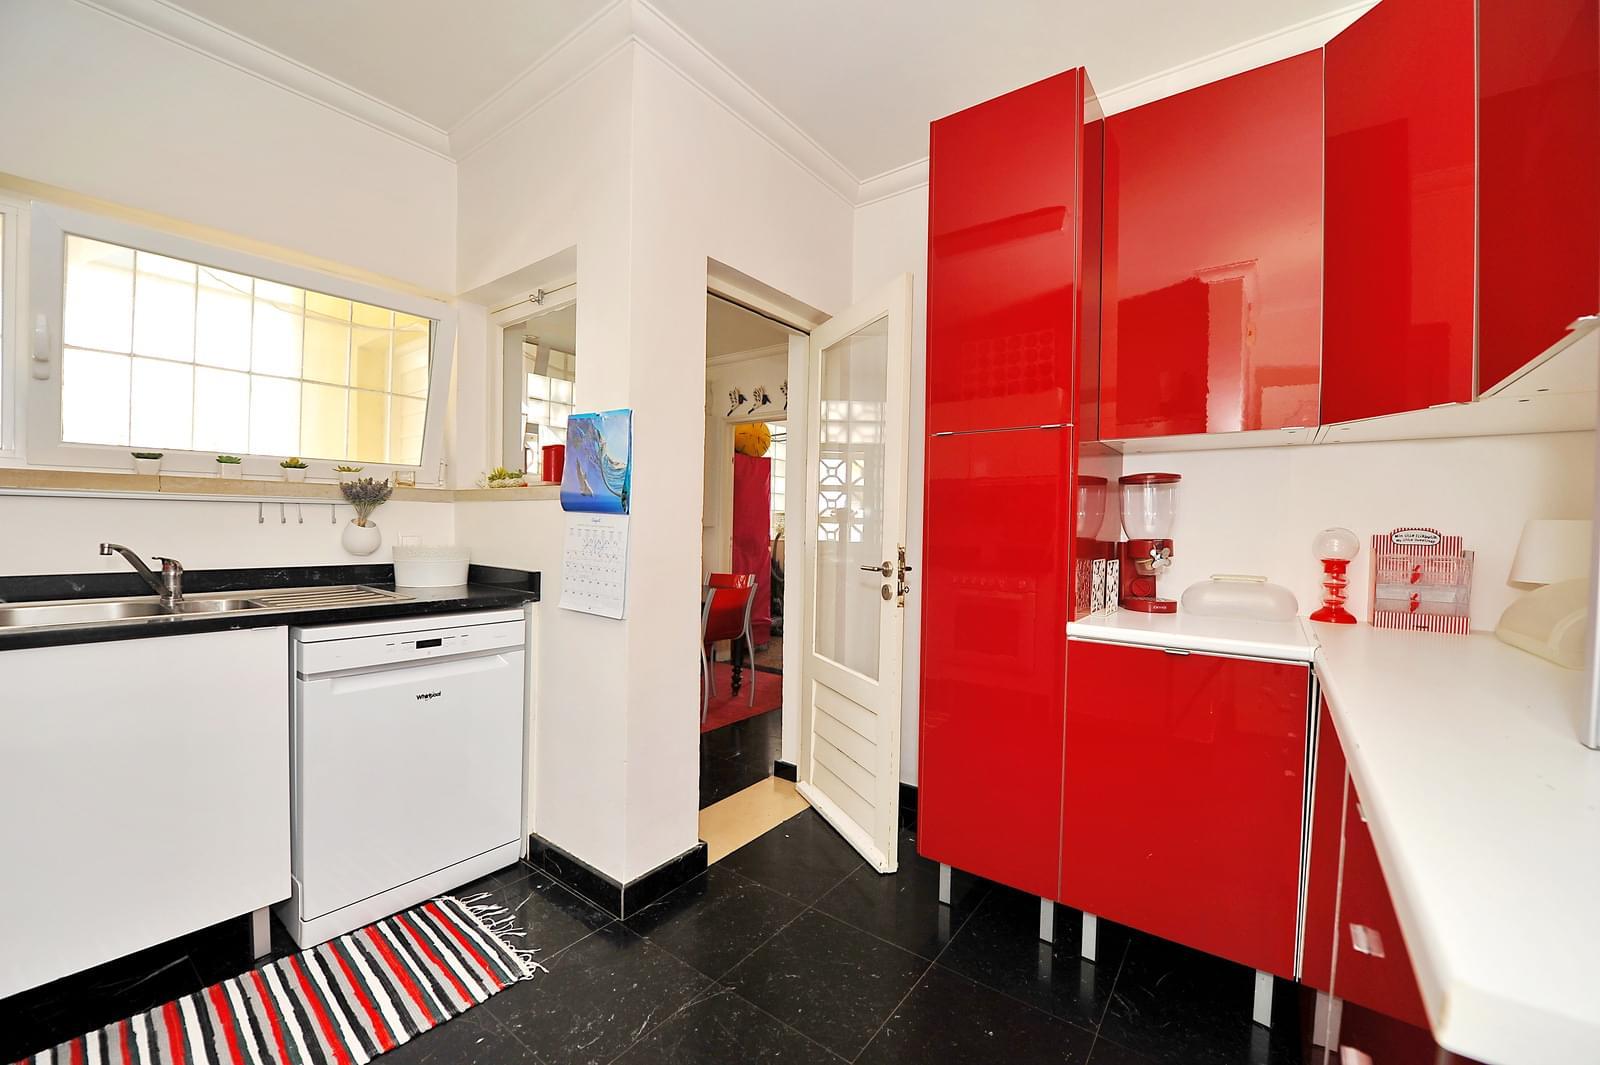 pf17942-apartamento-t4-1-cascais-0a99e0e6-8c4c-4287-ab2b-b21fe38e0edc